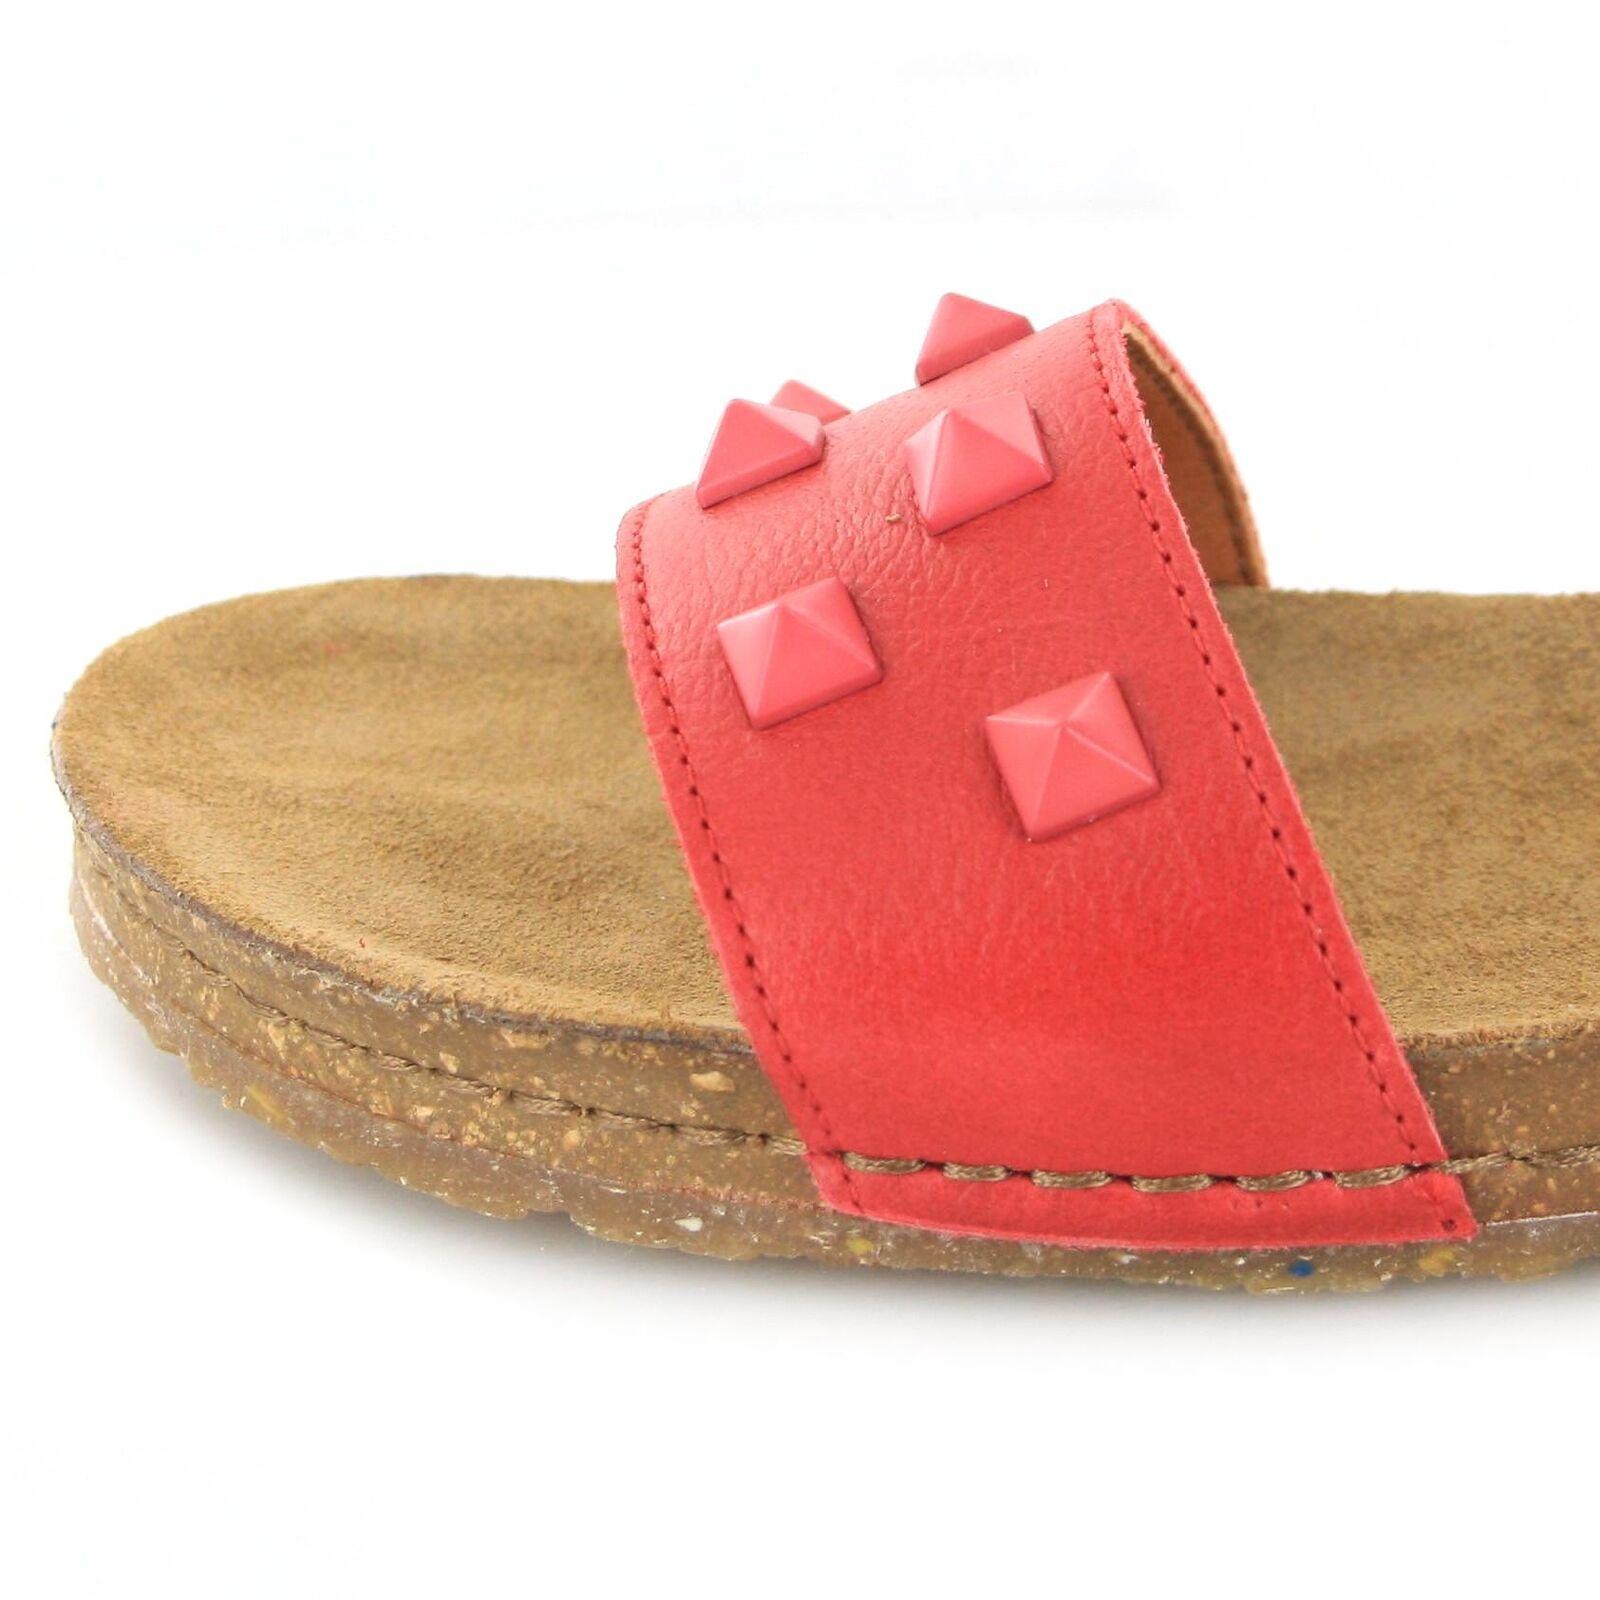 afdd3703 ... Tipo 1251a Creta Carmin cuero sandalia para señora rojo zapatos de  verano ...